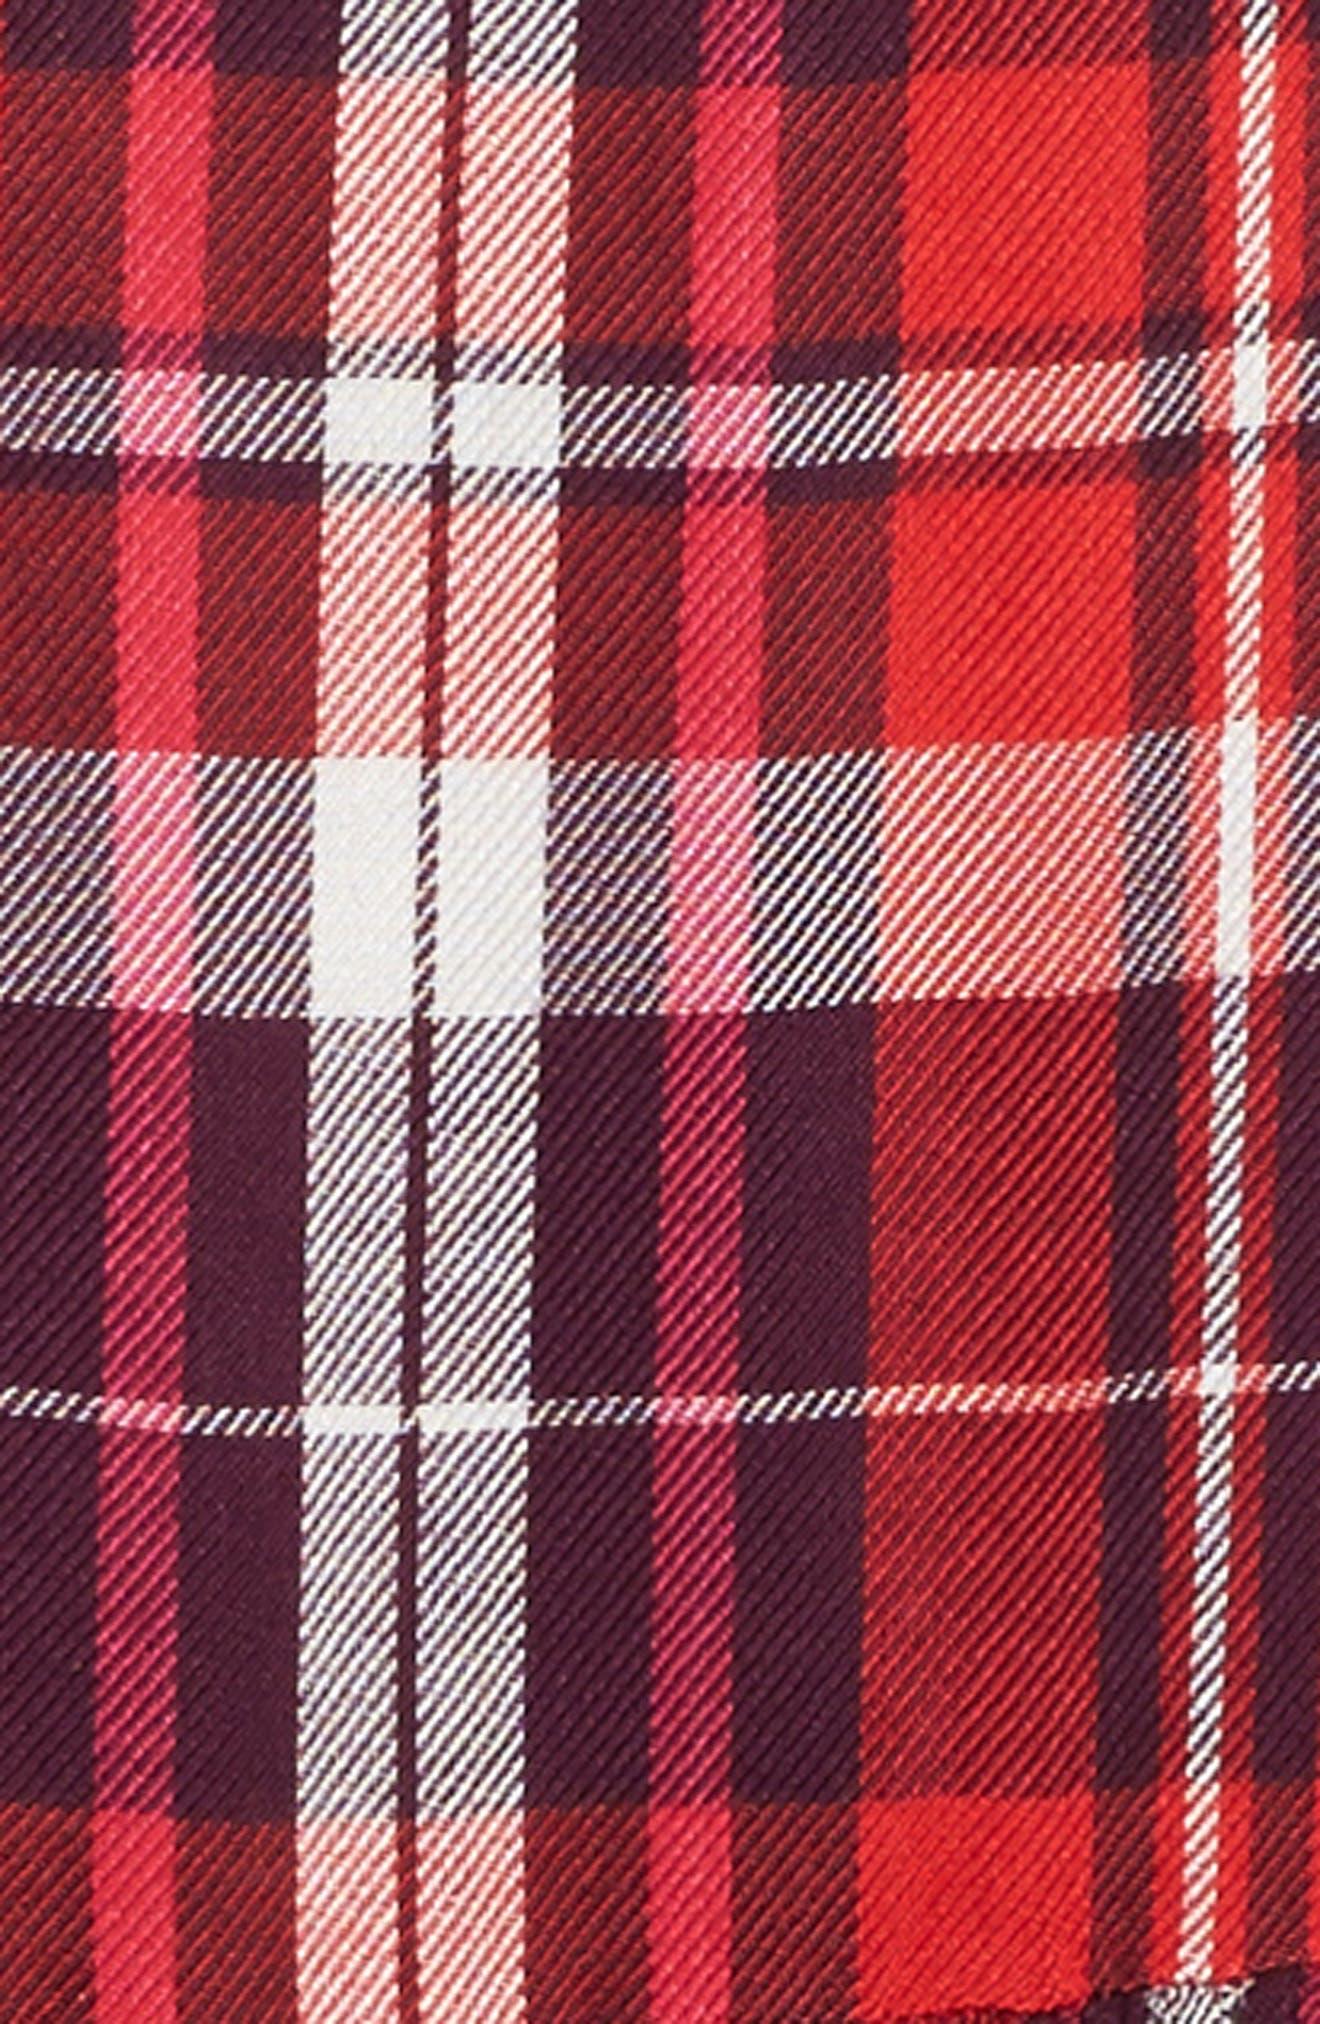 Plaid Flutter Sleeve Dress,                             Alternate thumbnail 3, color,                             610